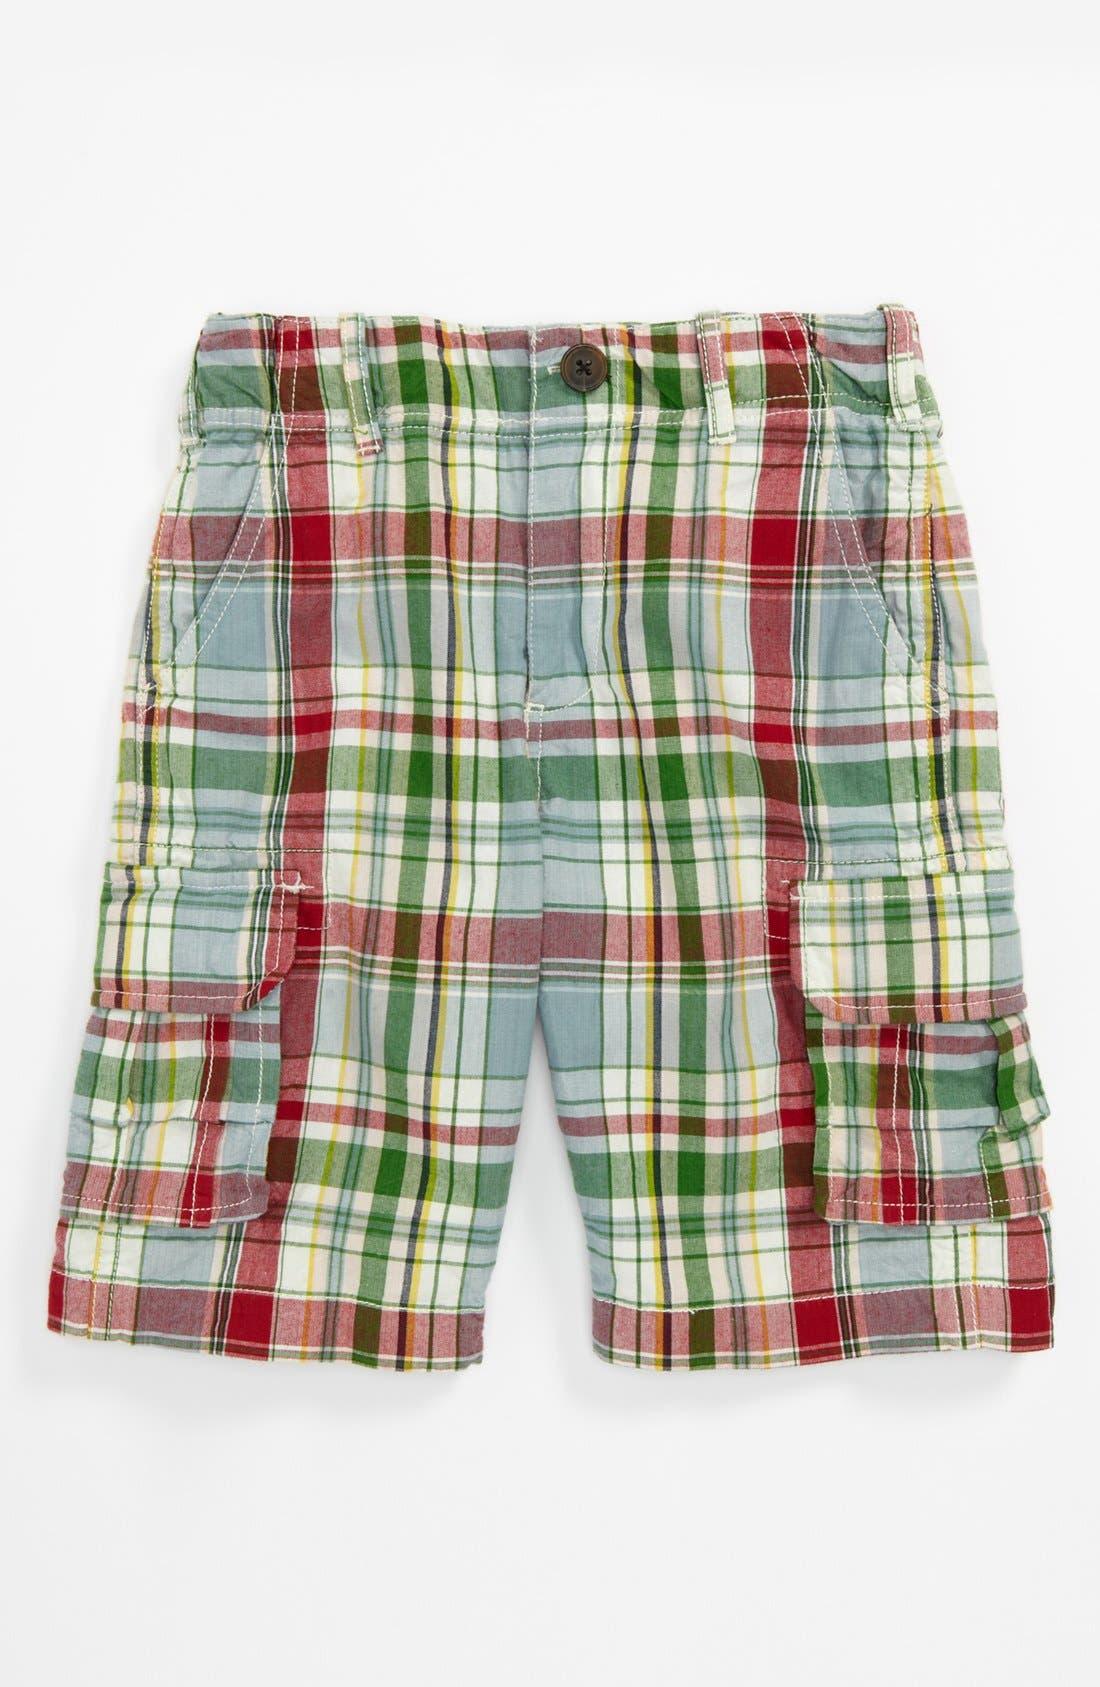 Alternate Image 1 Selected - Peek 'Lowell' Trail Shorts (Big Boys)